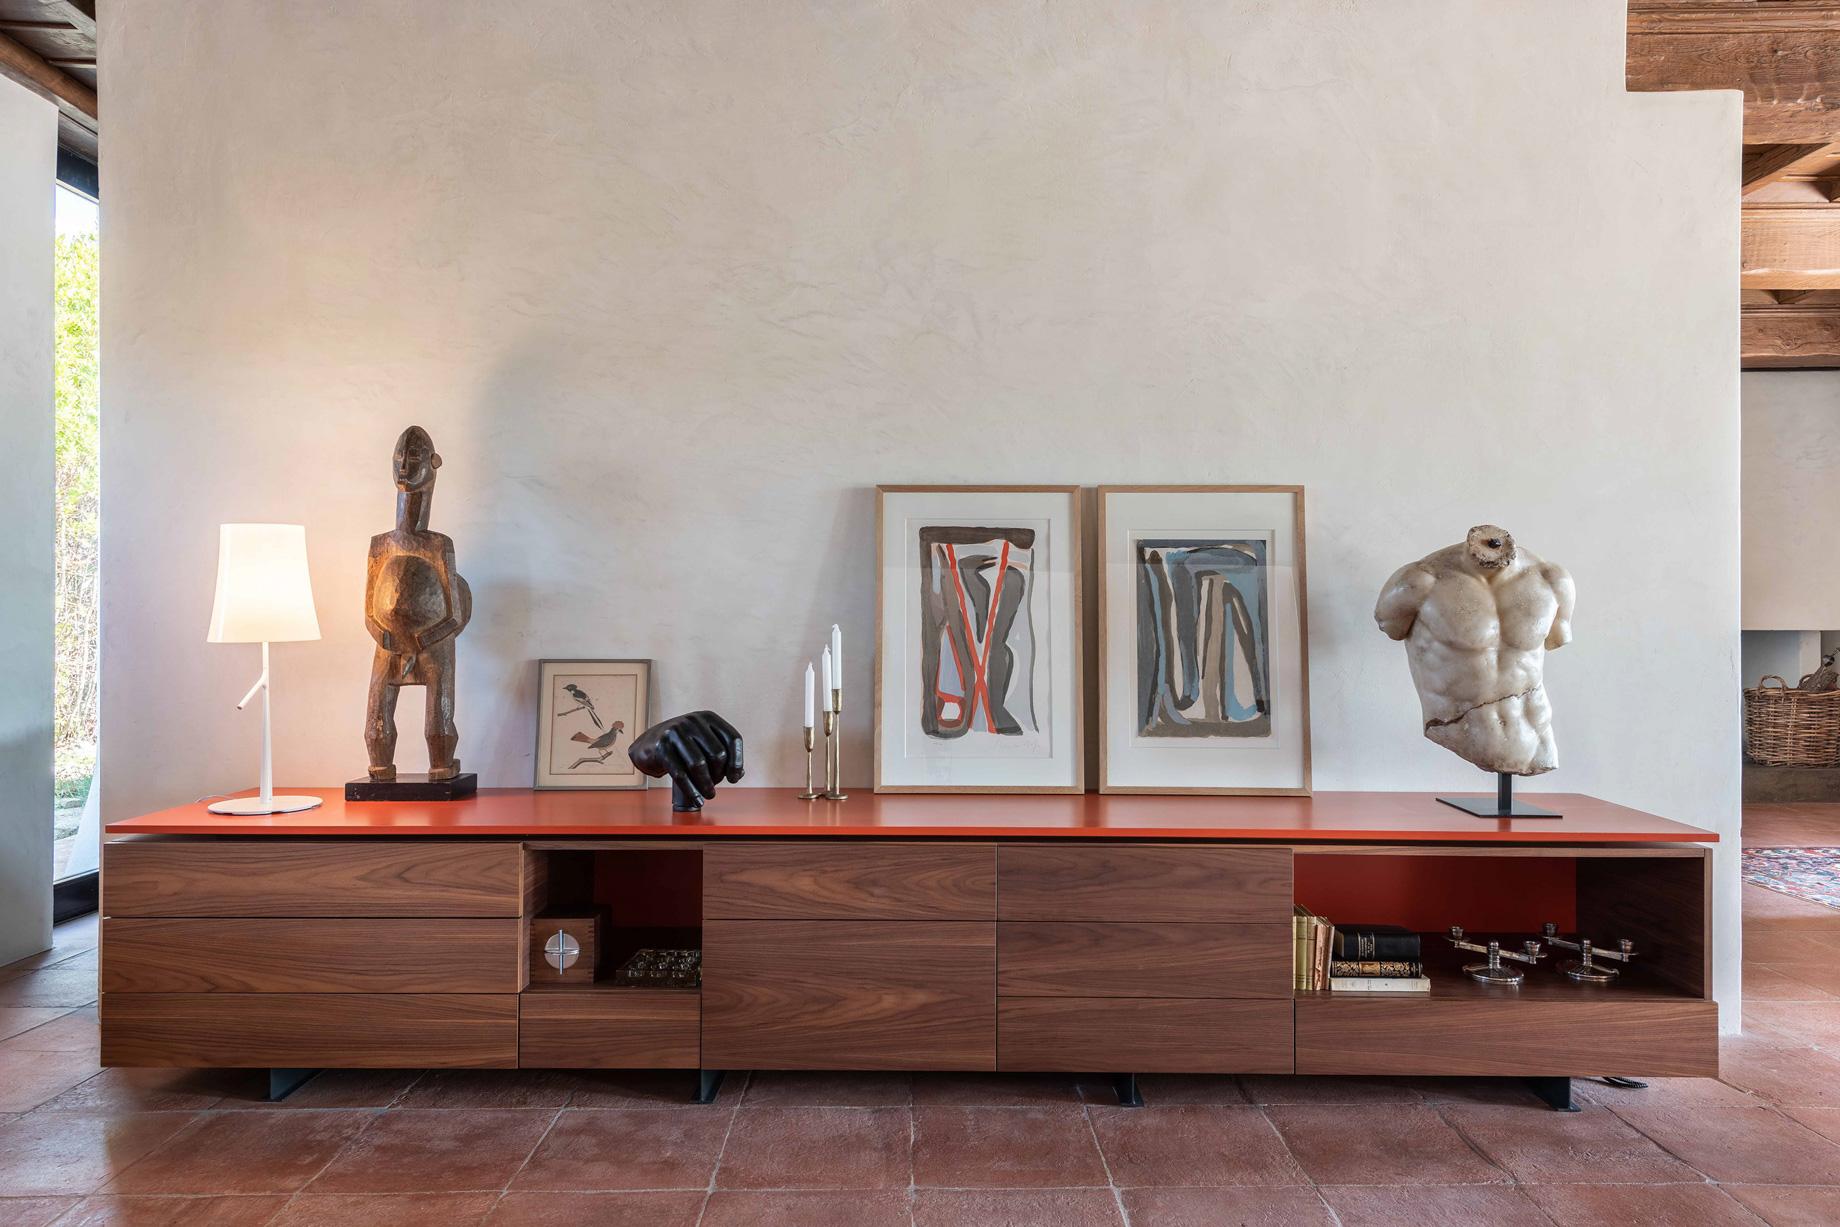 Maison Ache Interior Design Tuscany, Italy – Pierattelli Architetture